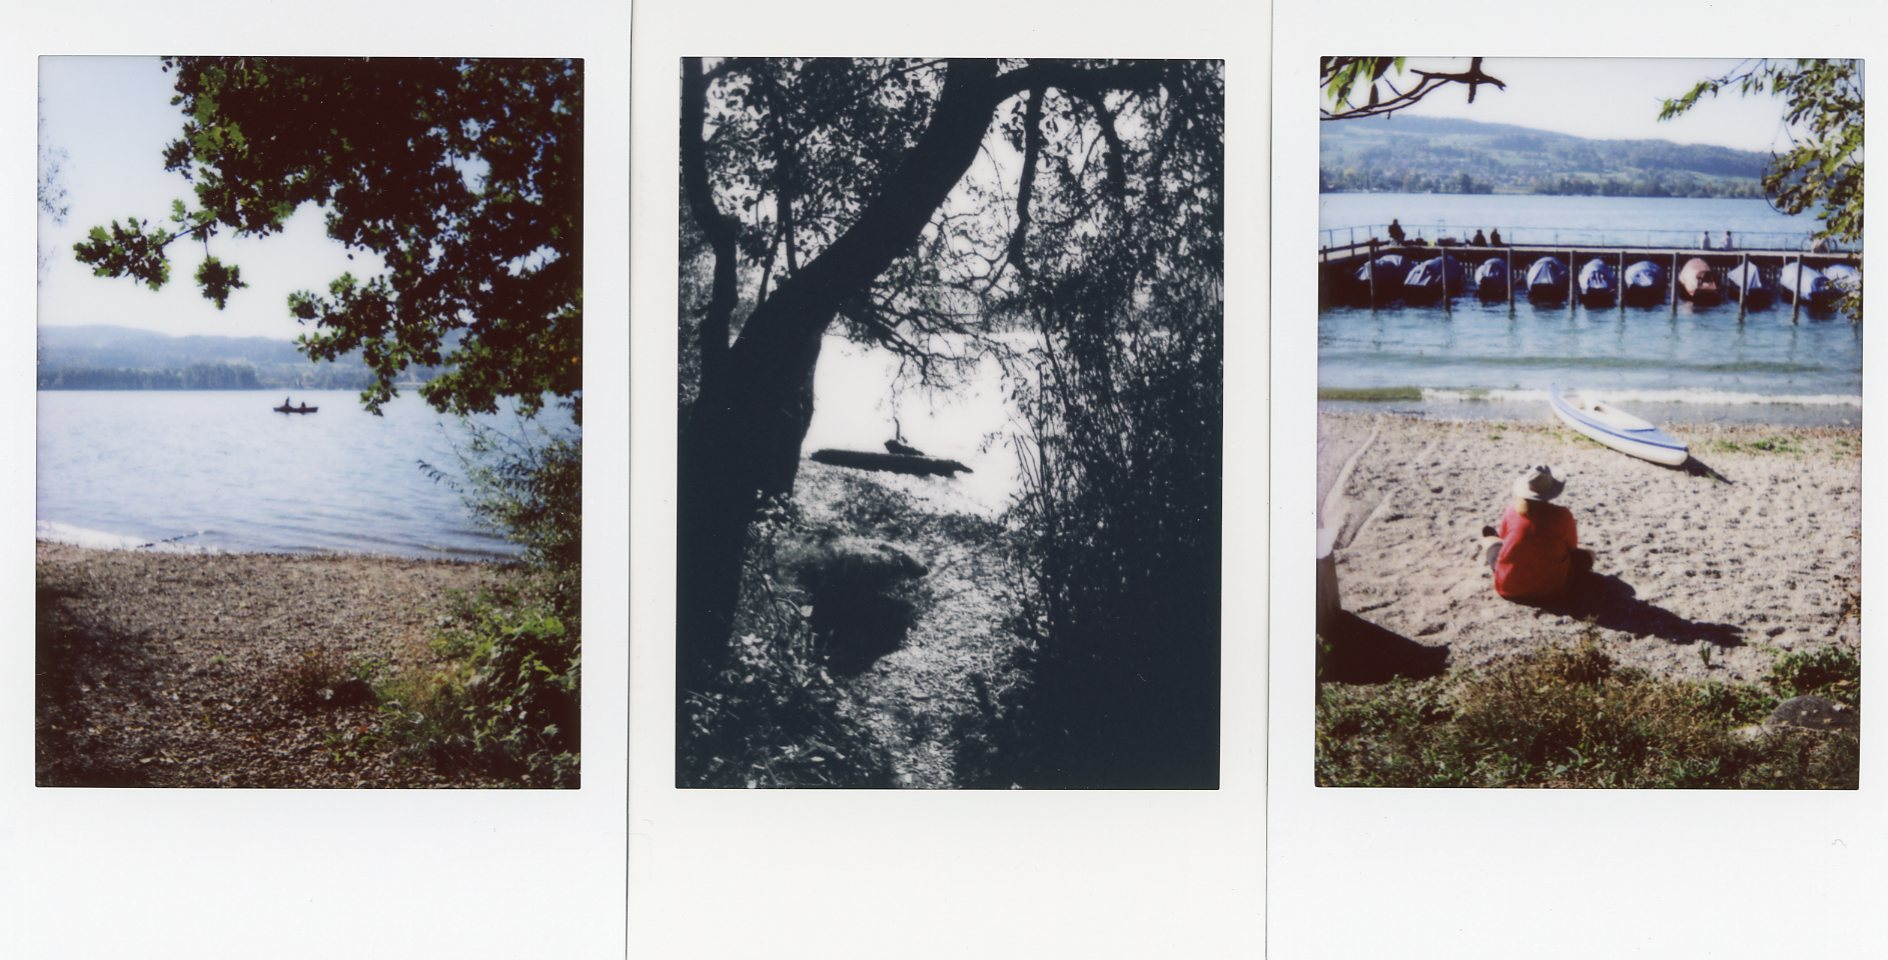 Beaches | Instax Mini 70 | Daniel Stoessel